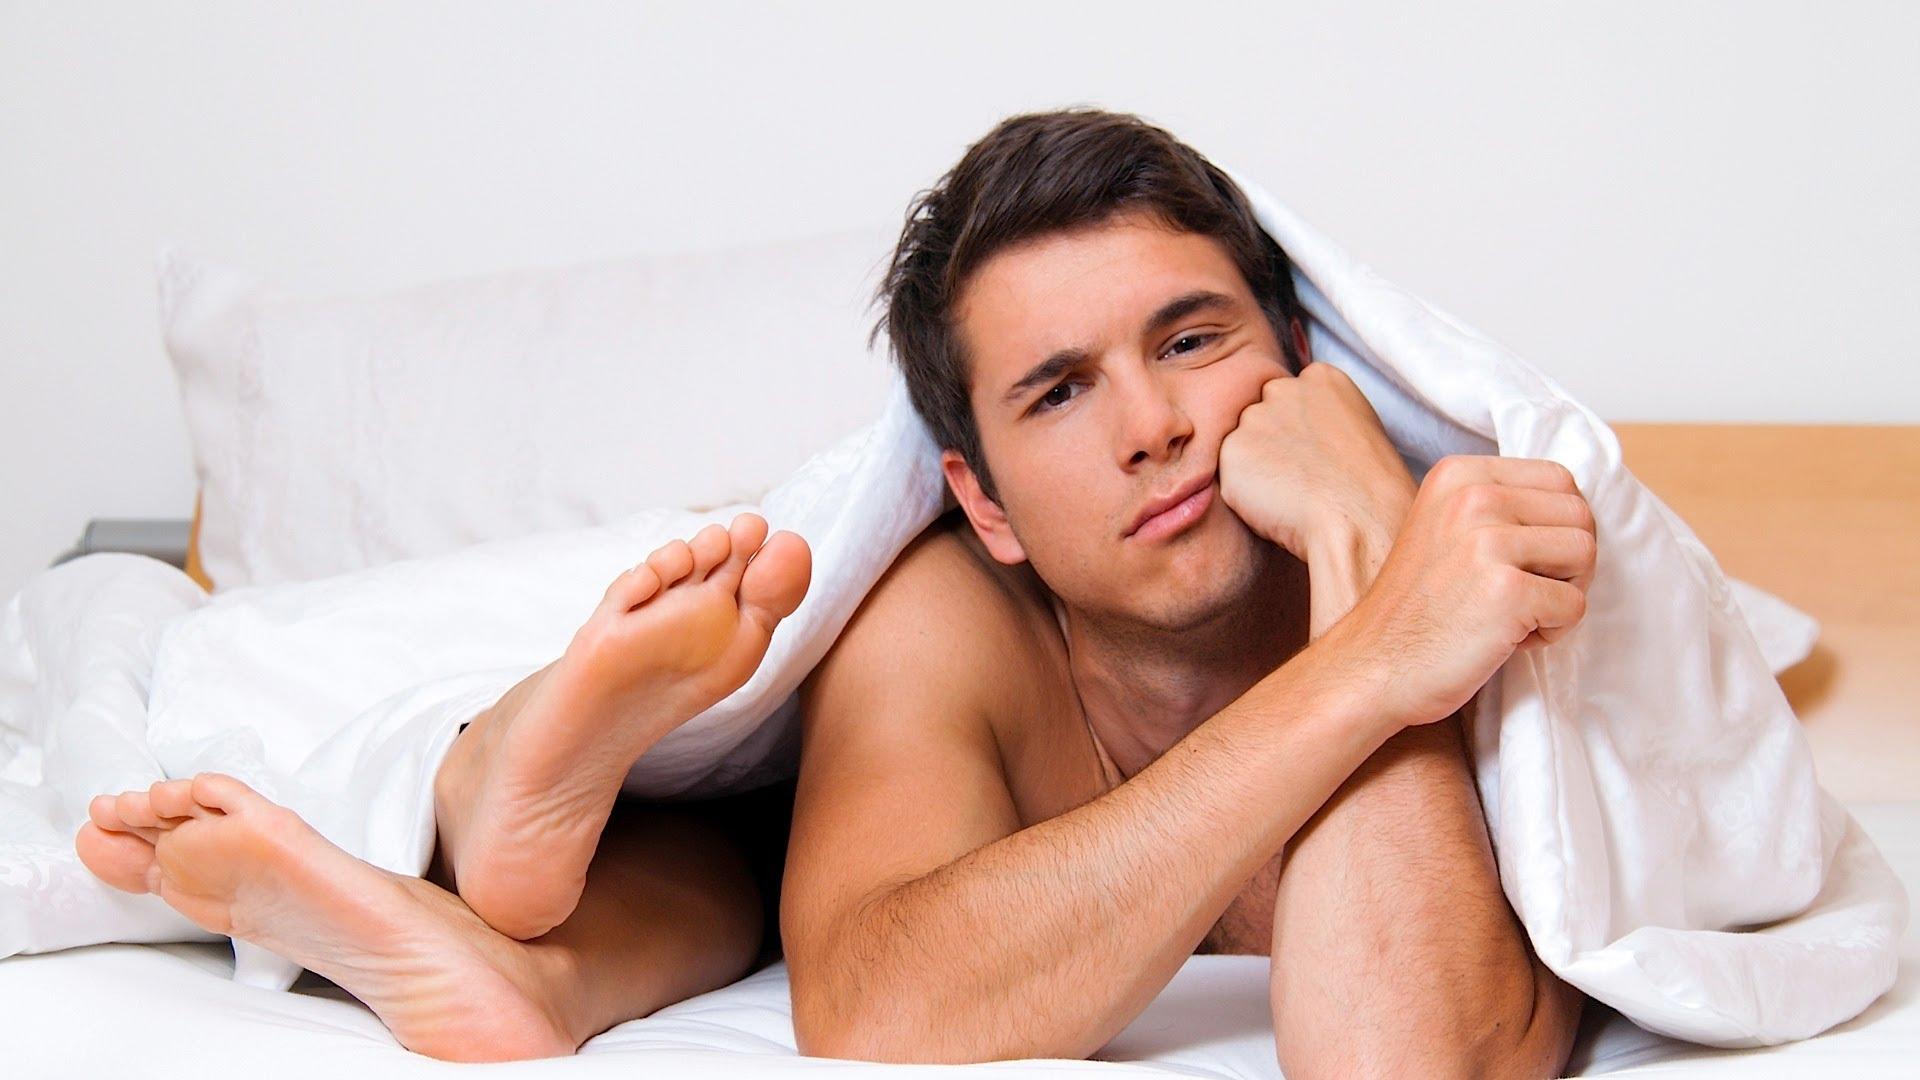 erectile-dysfunction-in-young-men.jpg